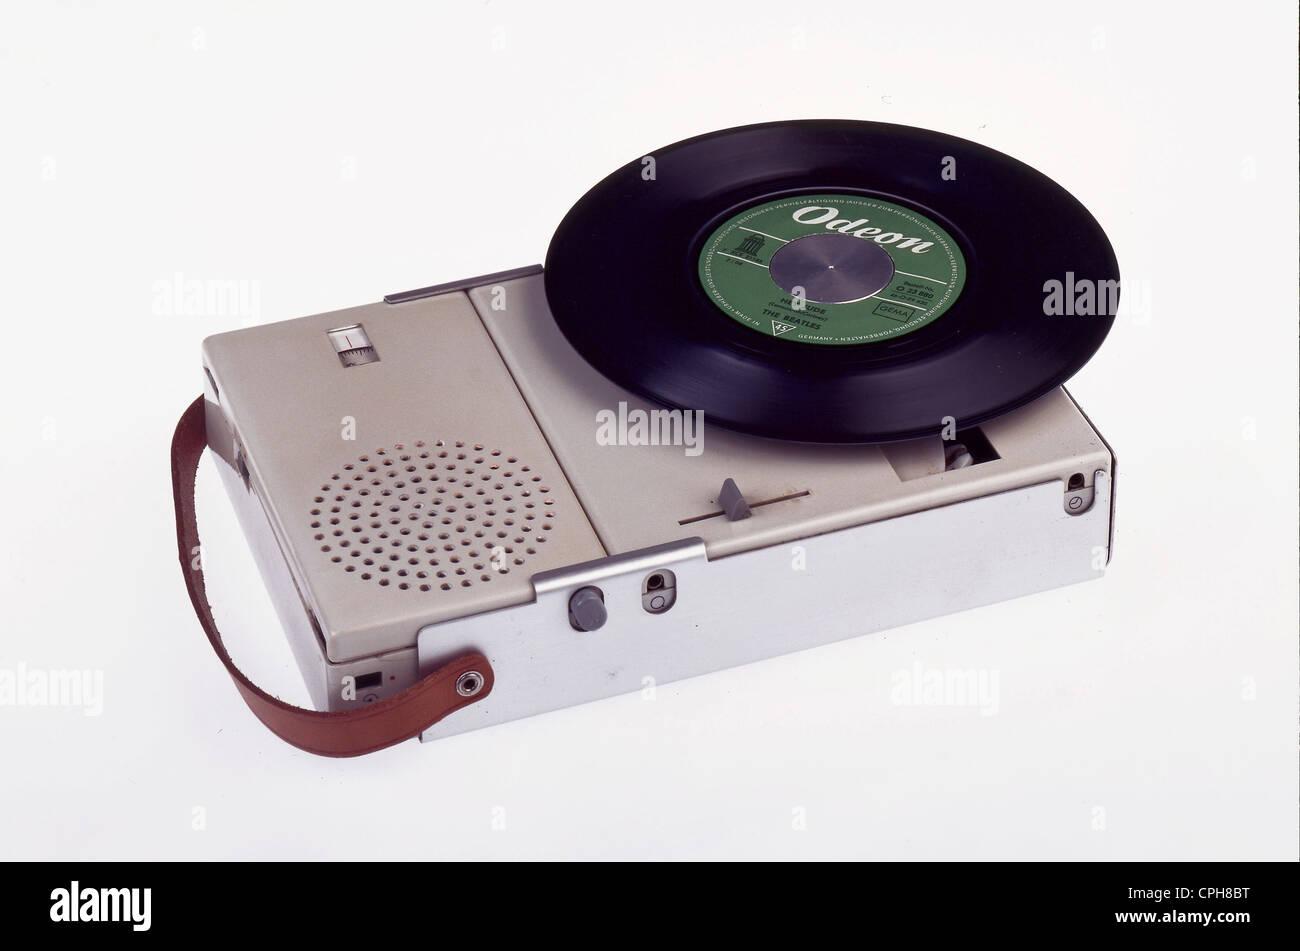 Technik, Plattenspieler, Braun, Version TP2, mit integriertem Radio, Phono-Kombination, Designer: Dieter Rams, Hochschule Stockbild